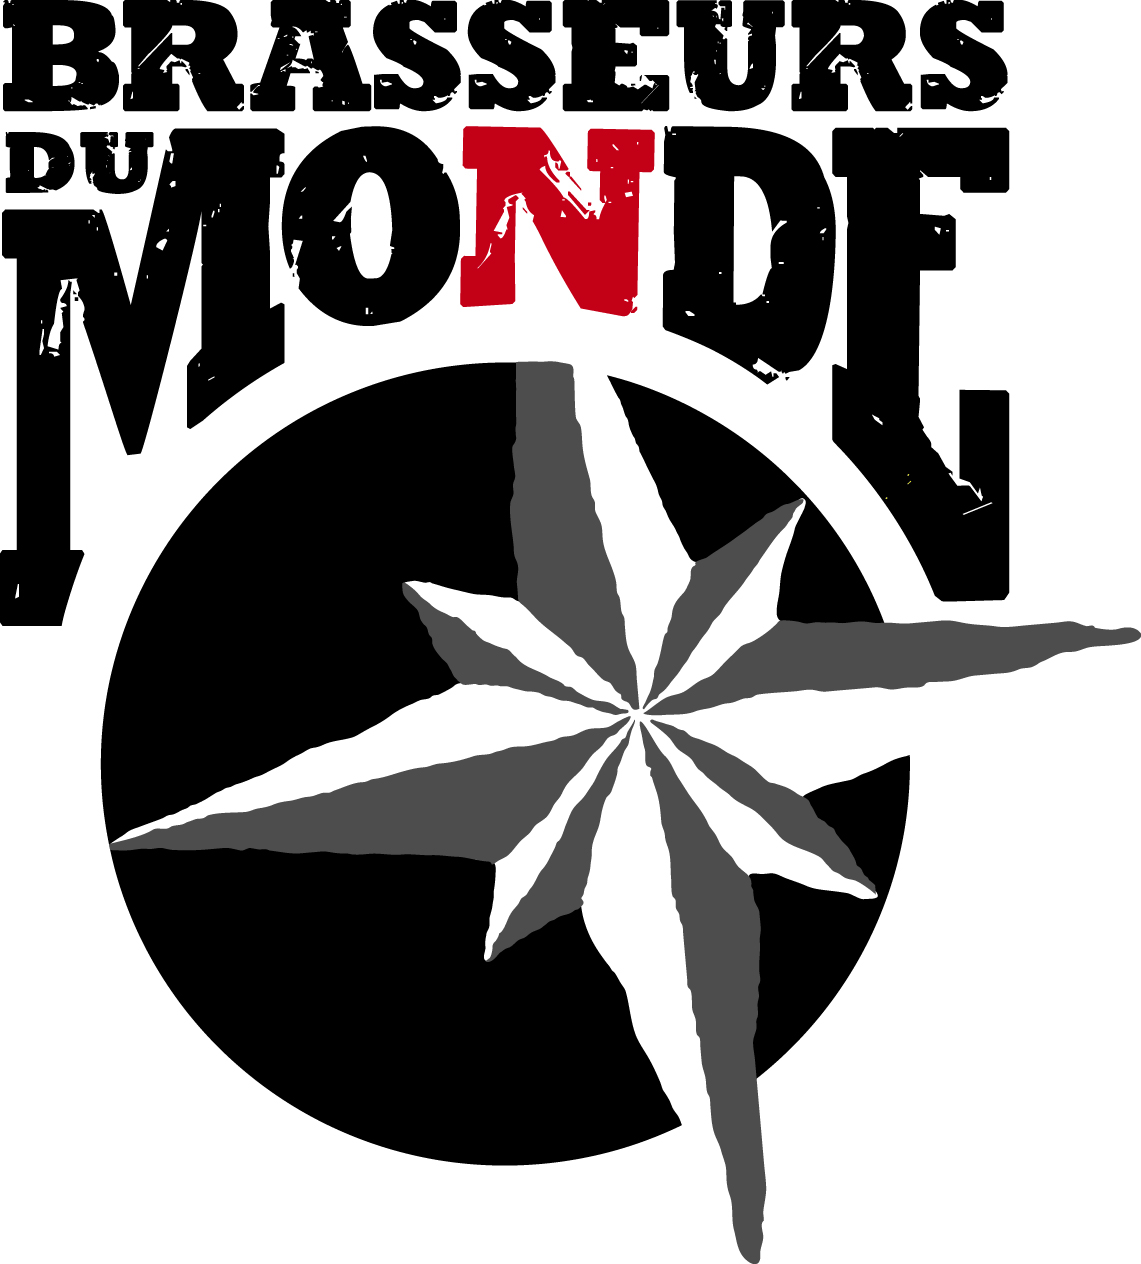 brasseur-logo.jpg